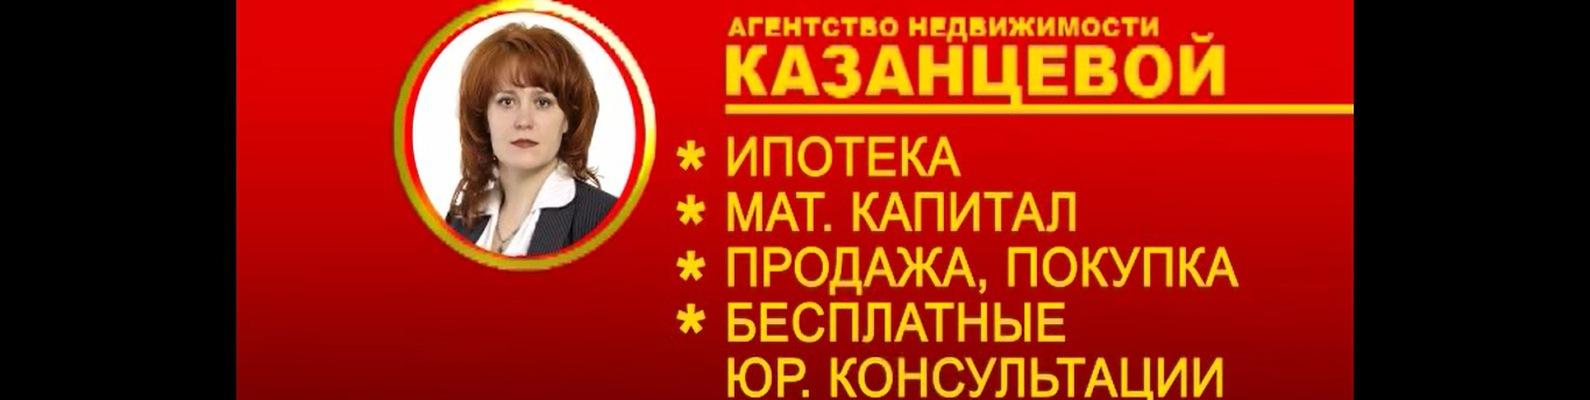 юрист саяногорска по недвижимости